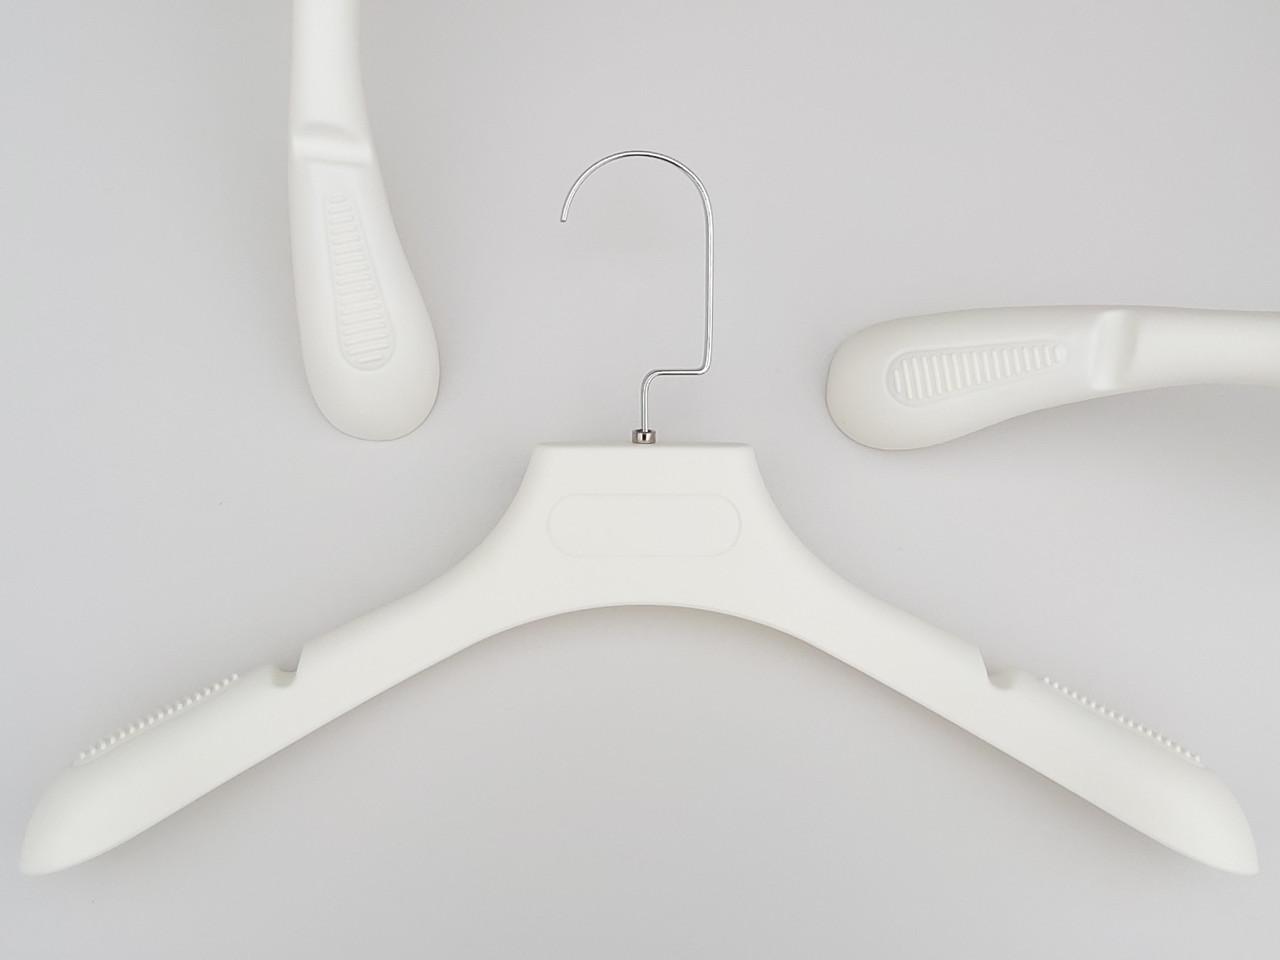 Плечики вешалки тремпеля TZ6681 с антискользящим ребристым плечом молочного цвета, длина 39 см